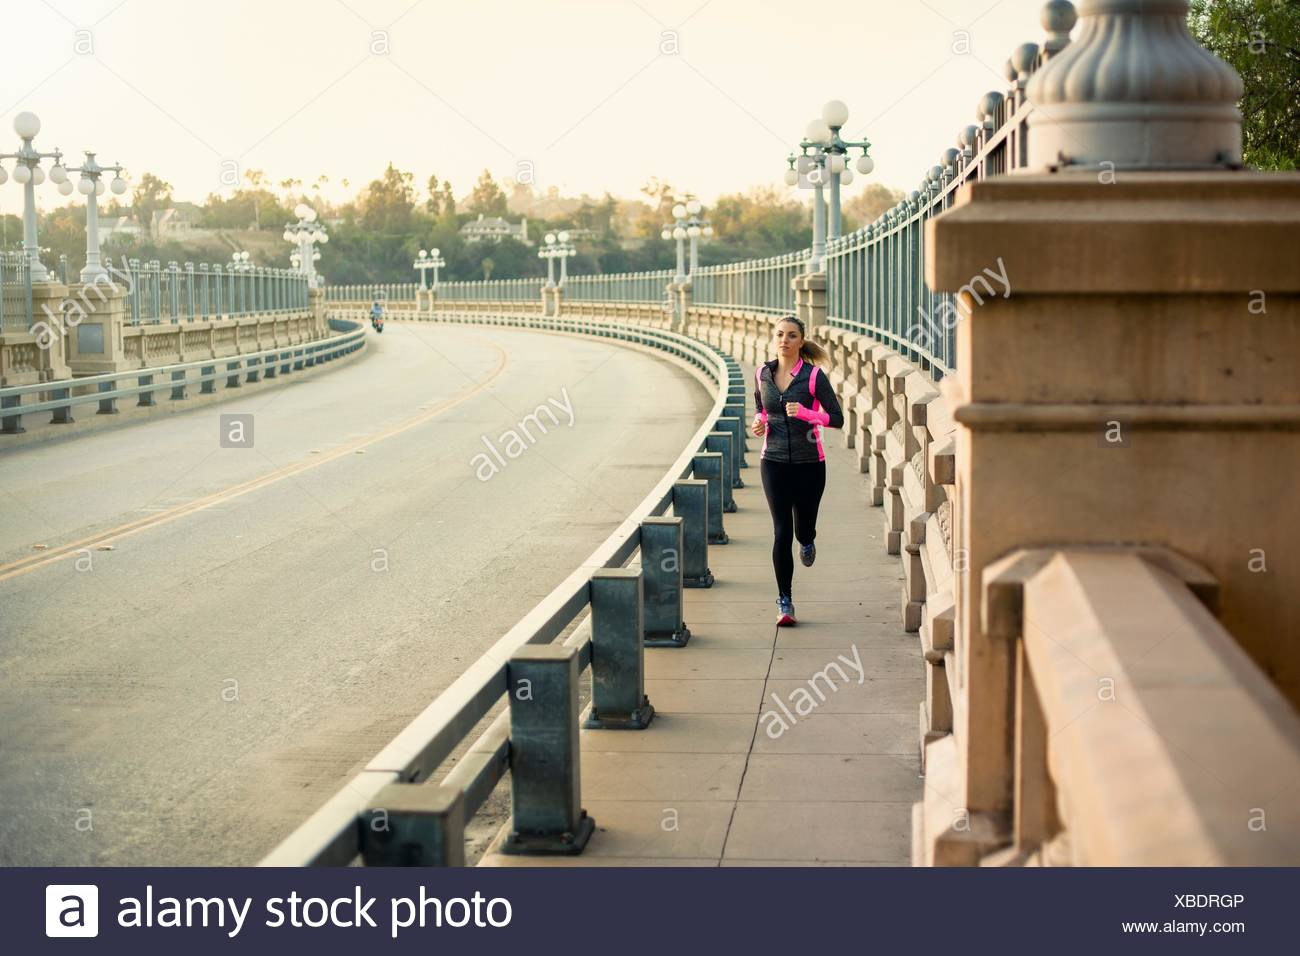 Jogger running on bridge, Arroyo Seco Park, Pasadena, California, USA - Stock Image